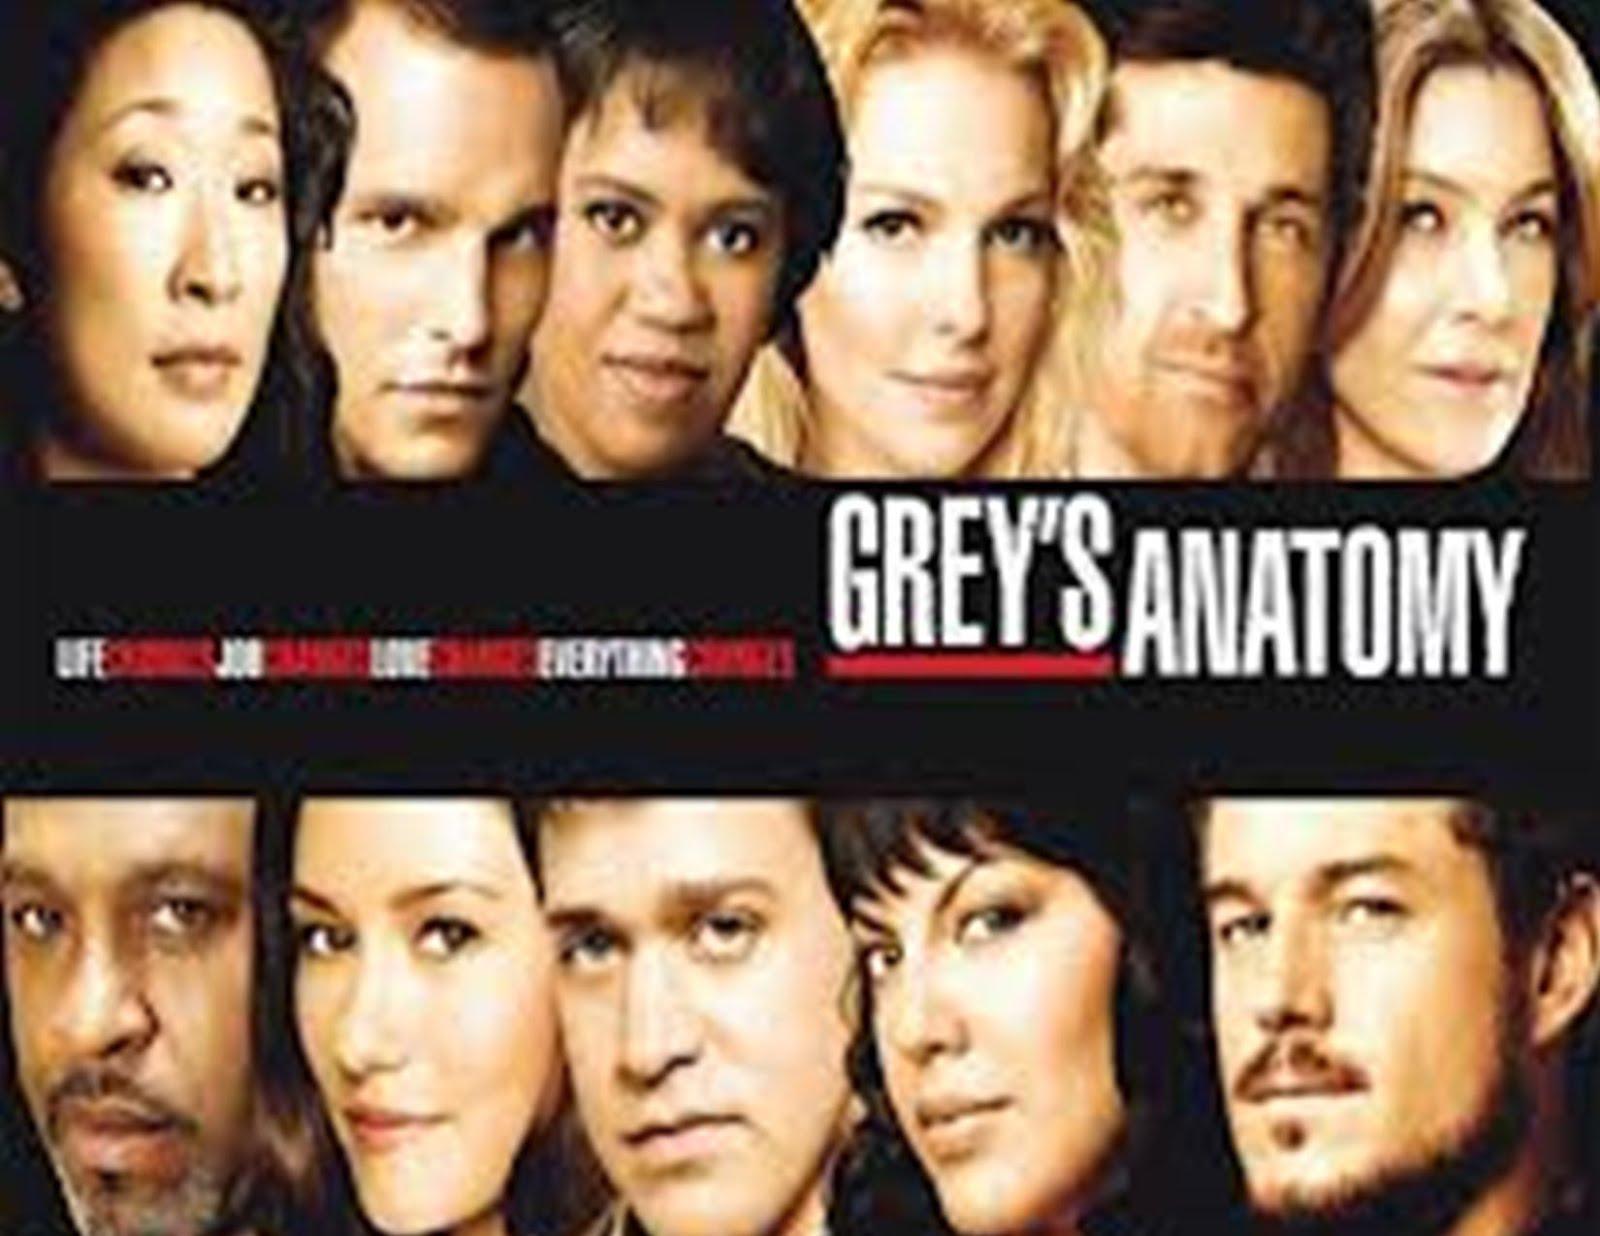 Greys anatomy season 10 episode 2 online watch : Imprimante canon ...